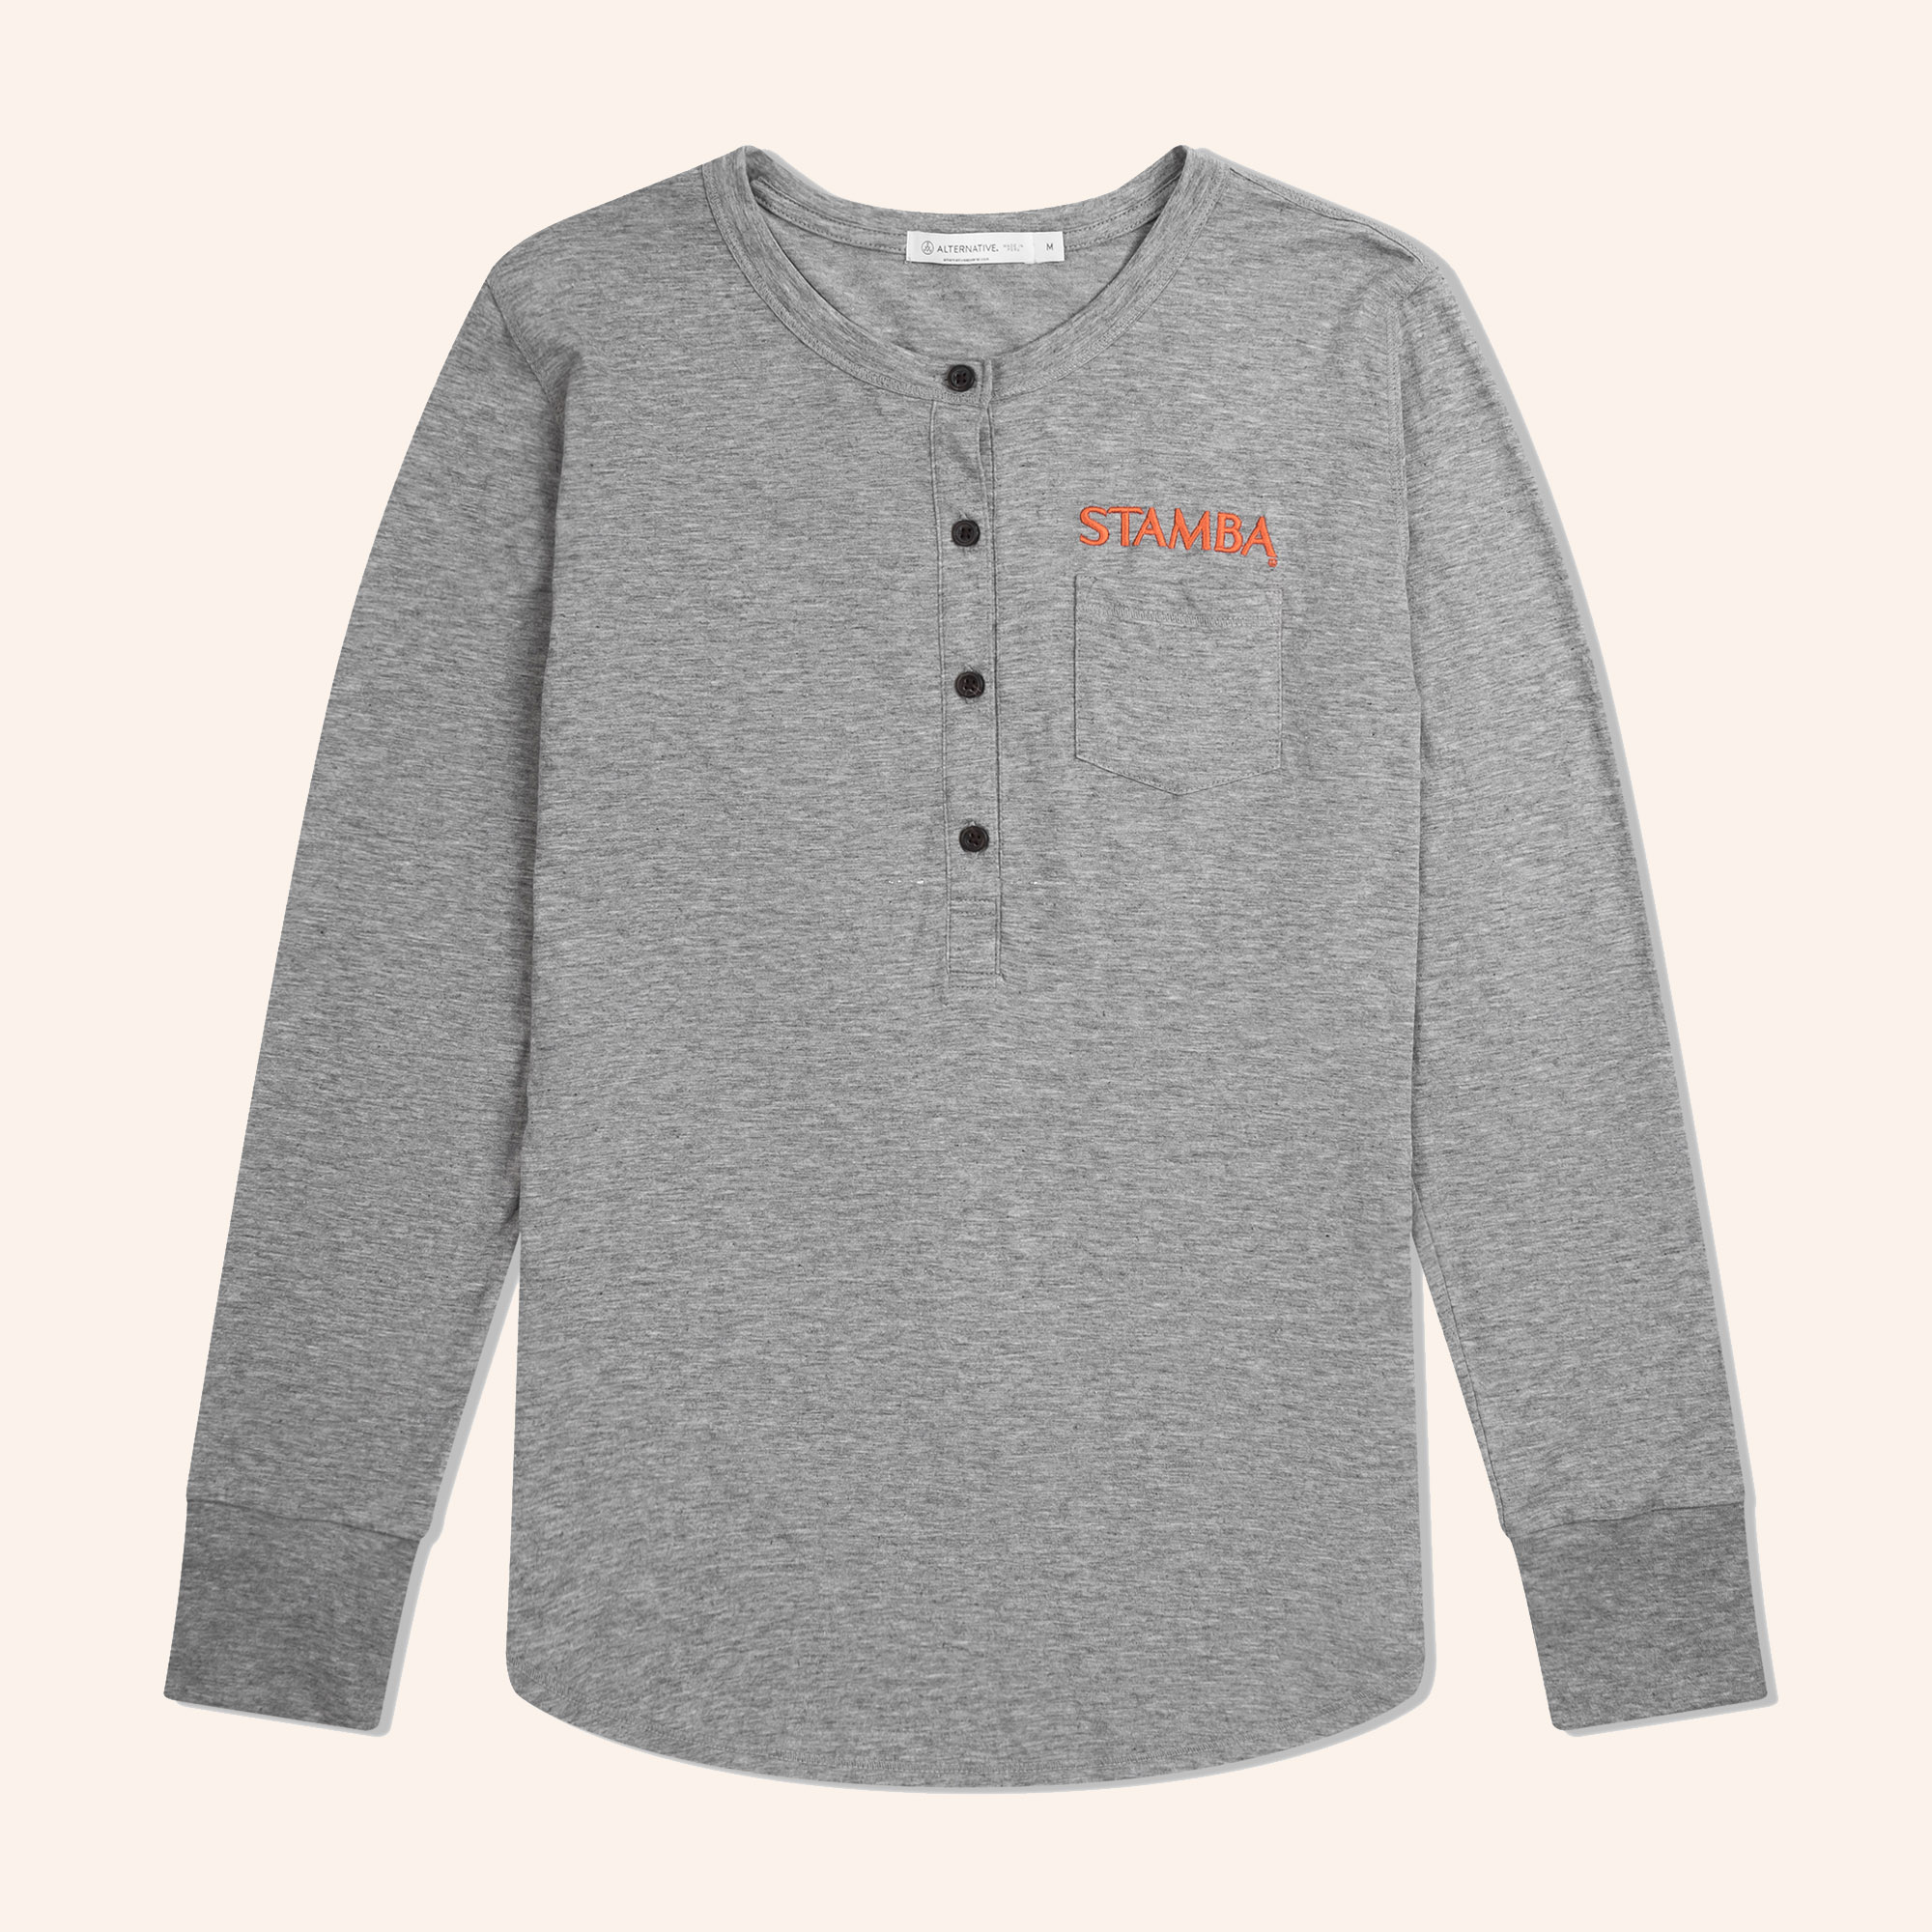 STAMBA grey shirt1 website.jpg